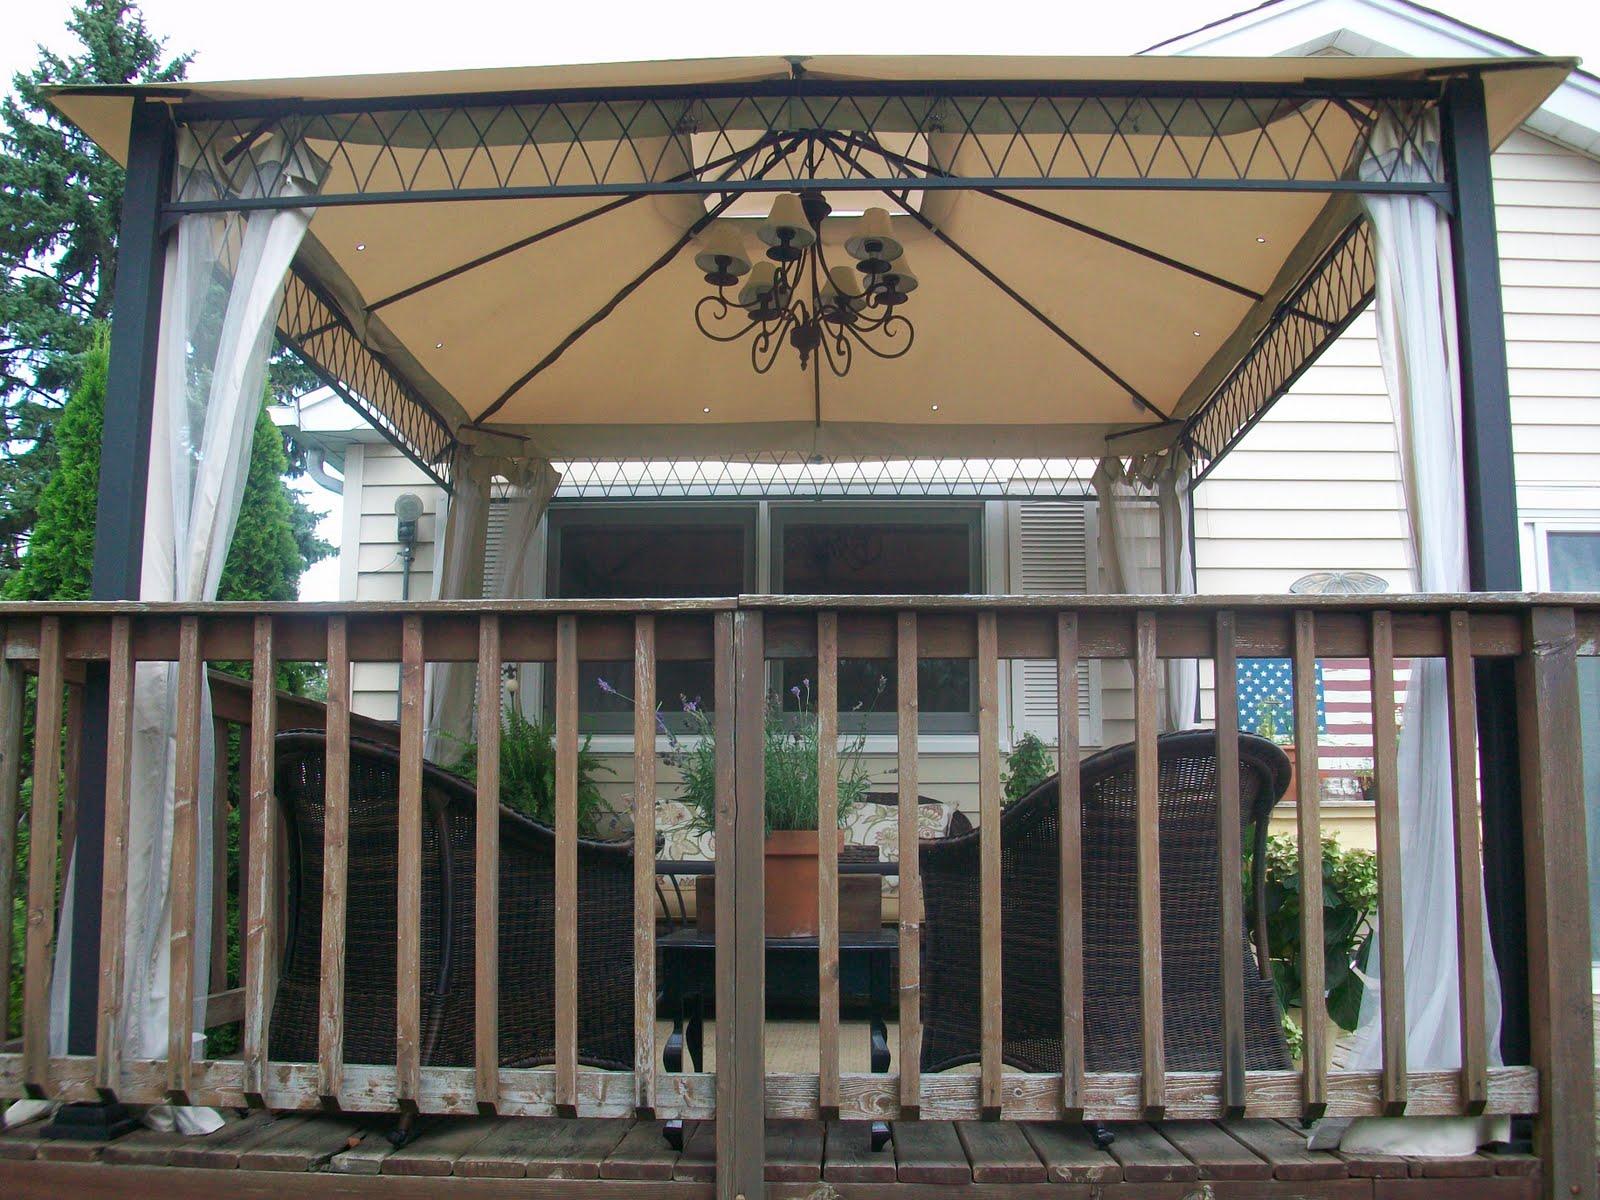 Outdoor gazebo lighting ideas homesfeed for 12x12 dining room